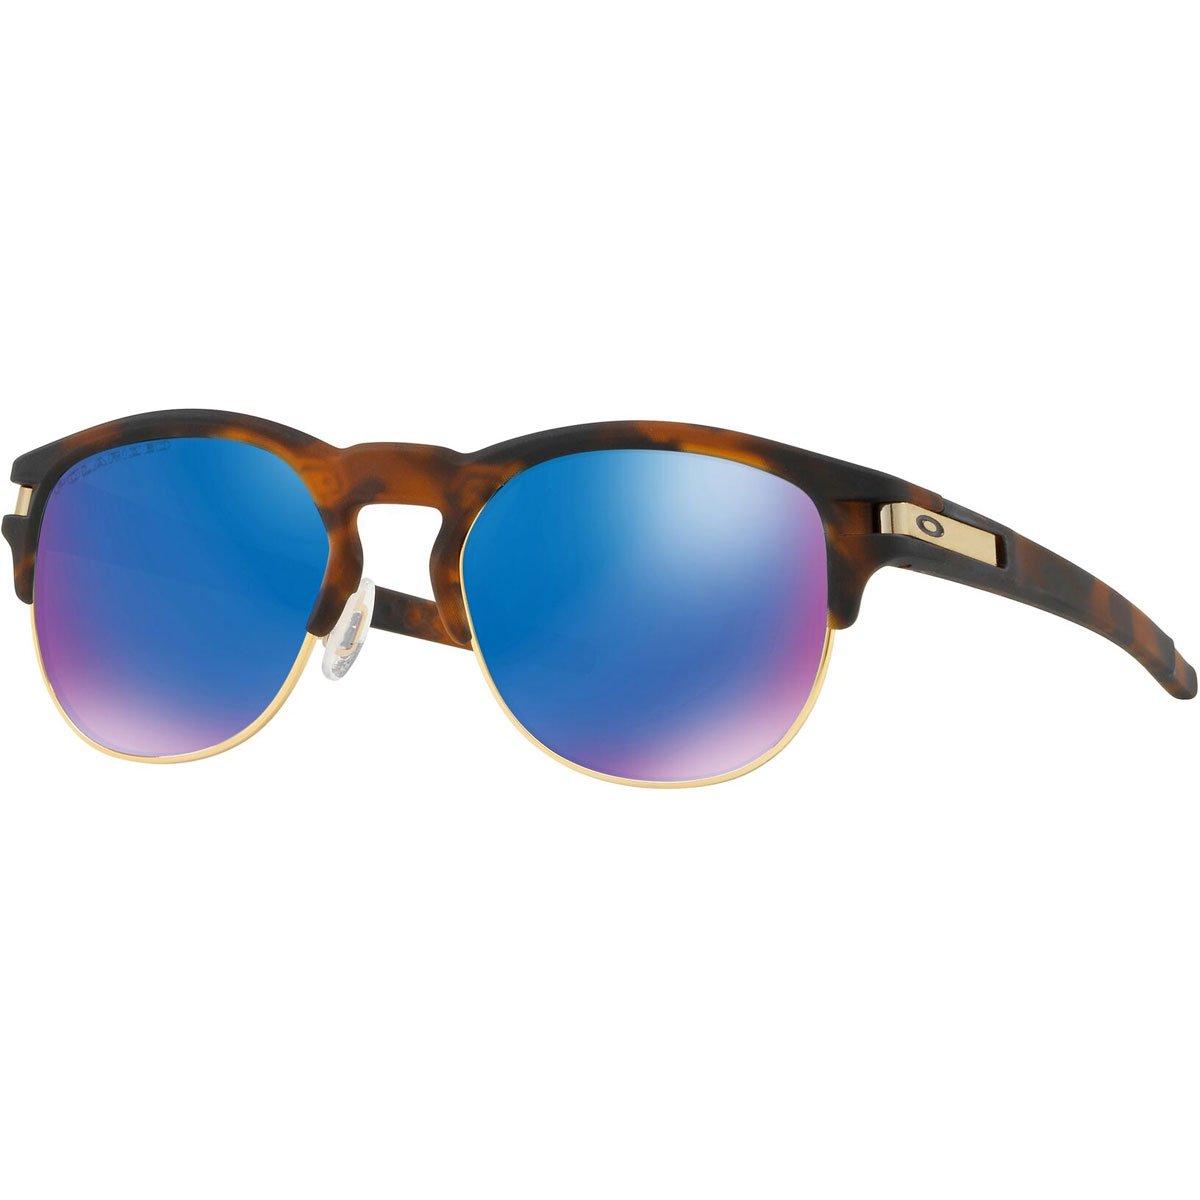 Oakley Men's OO9394 Latch Key Round Sunglasses, Matte Brown Tortoise/Sapphire Iridium Polarized, 52 mm by Oakley